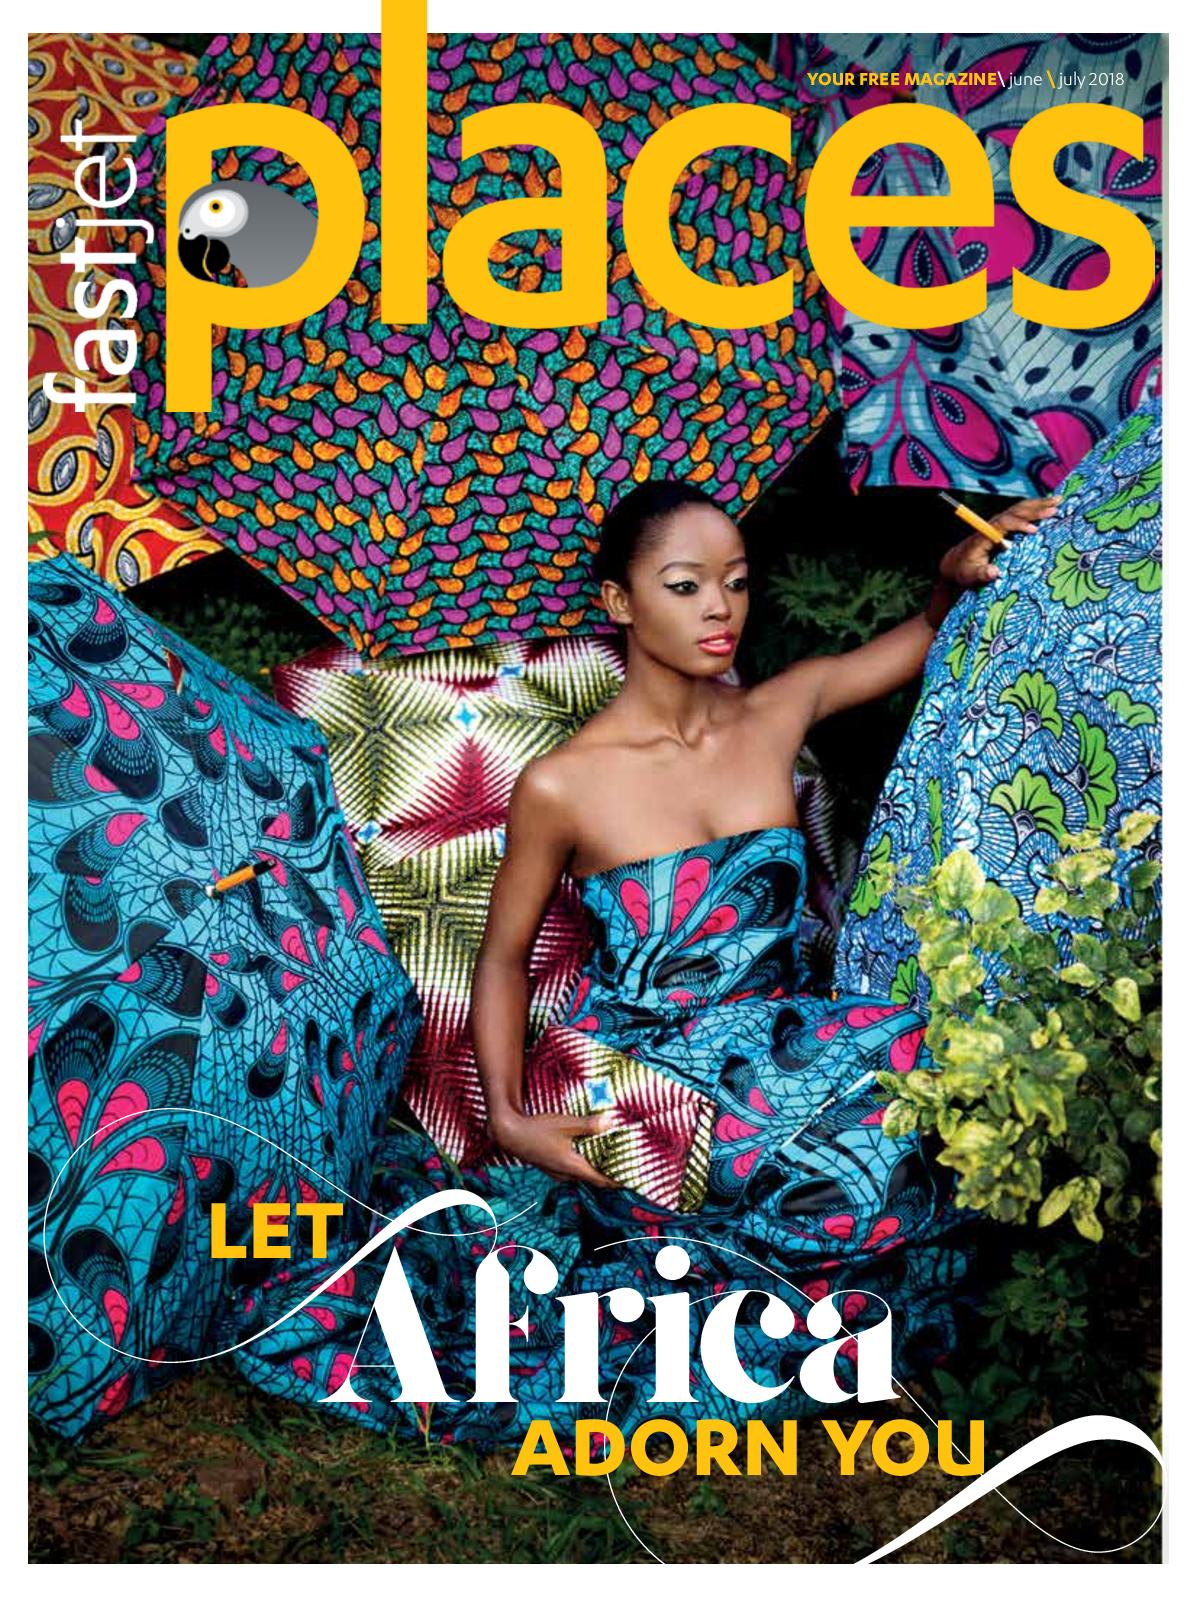 38829f1dba14 Calaméo - Places Magazine June July 2018